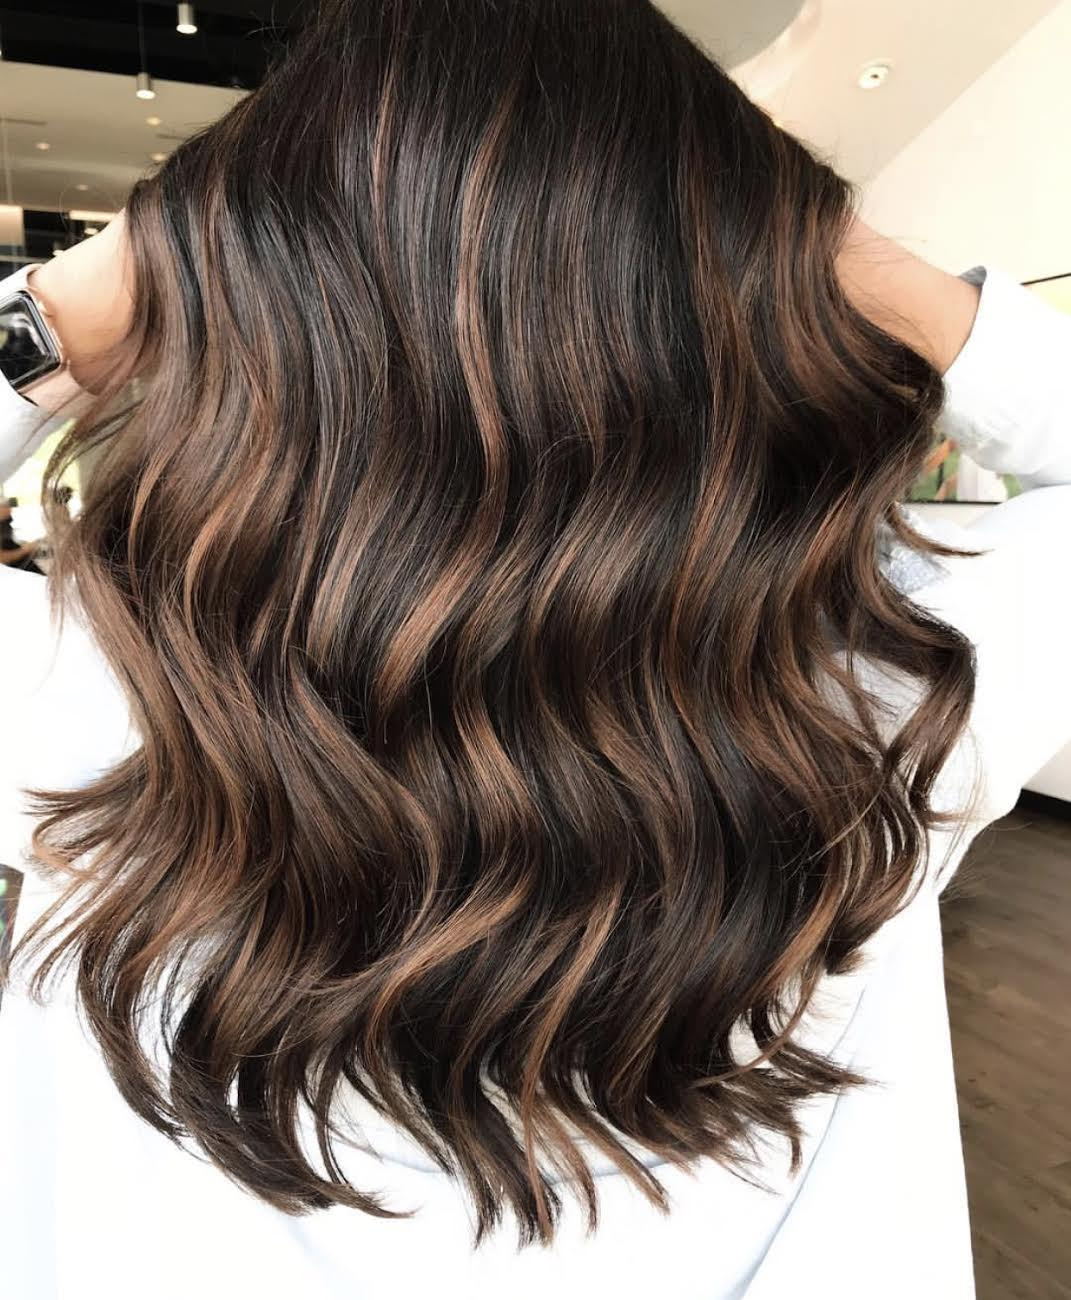 Dark Chocolate Hair Color by Taylor at Tangerine Salon Dallas